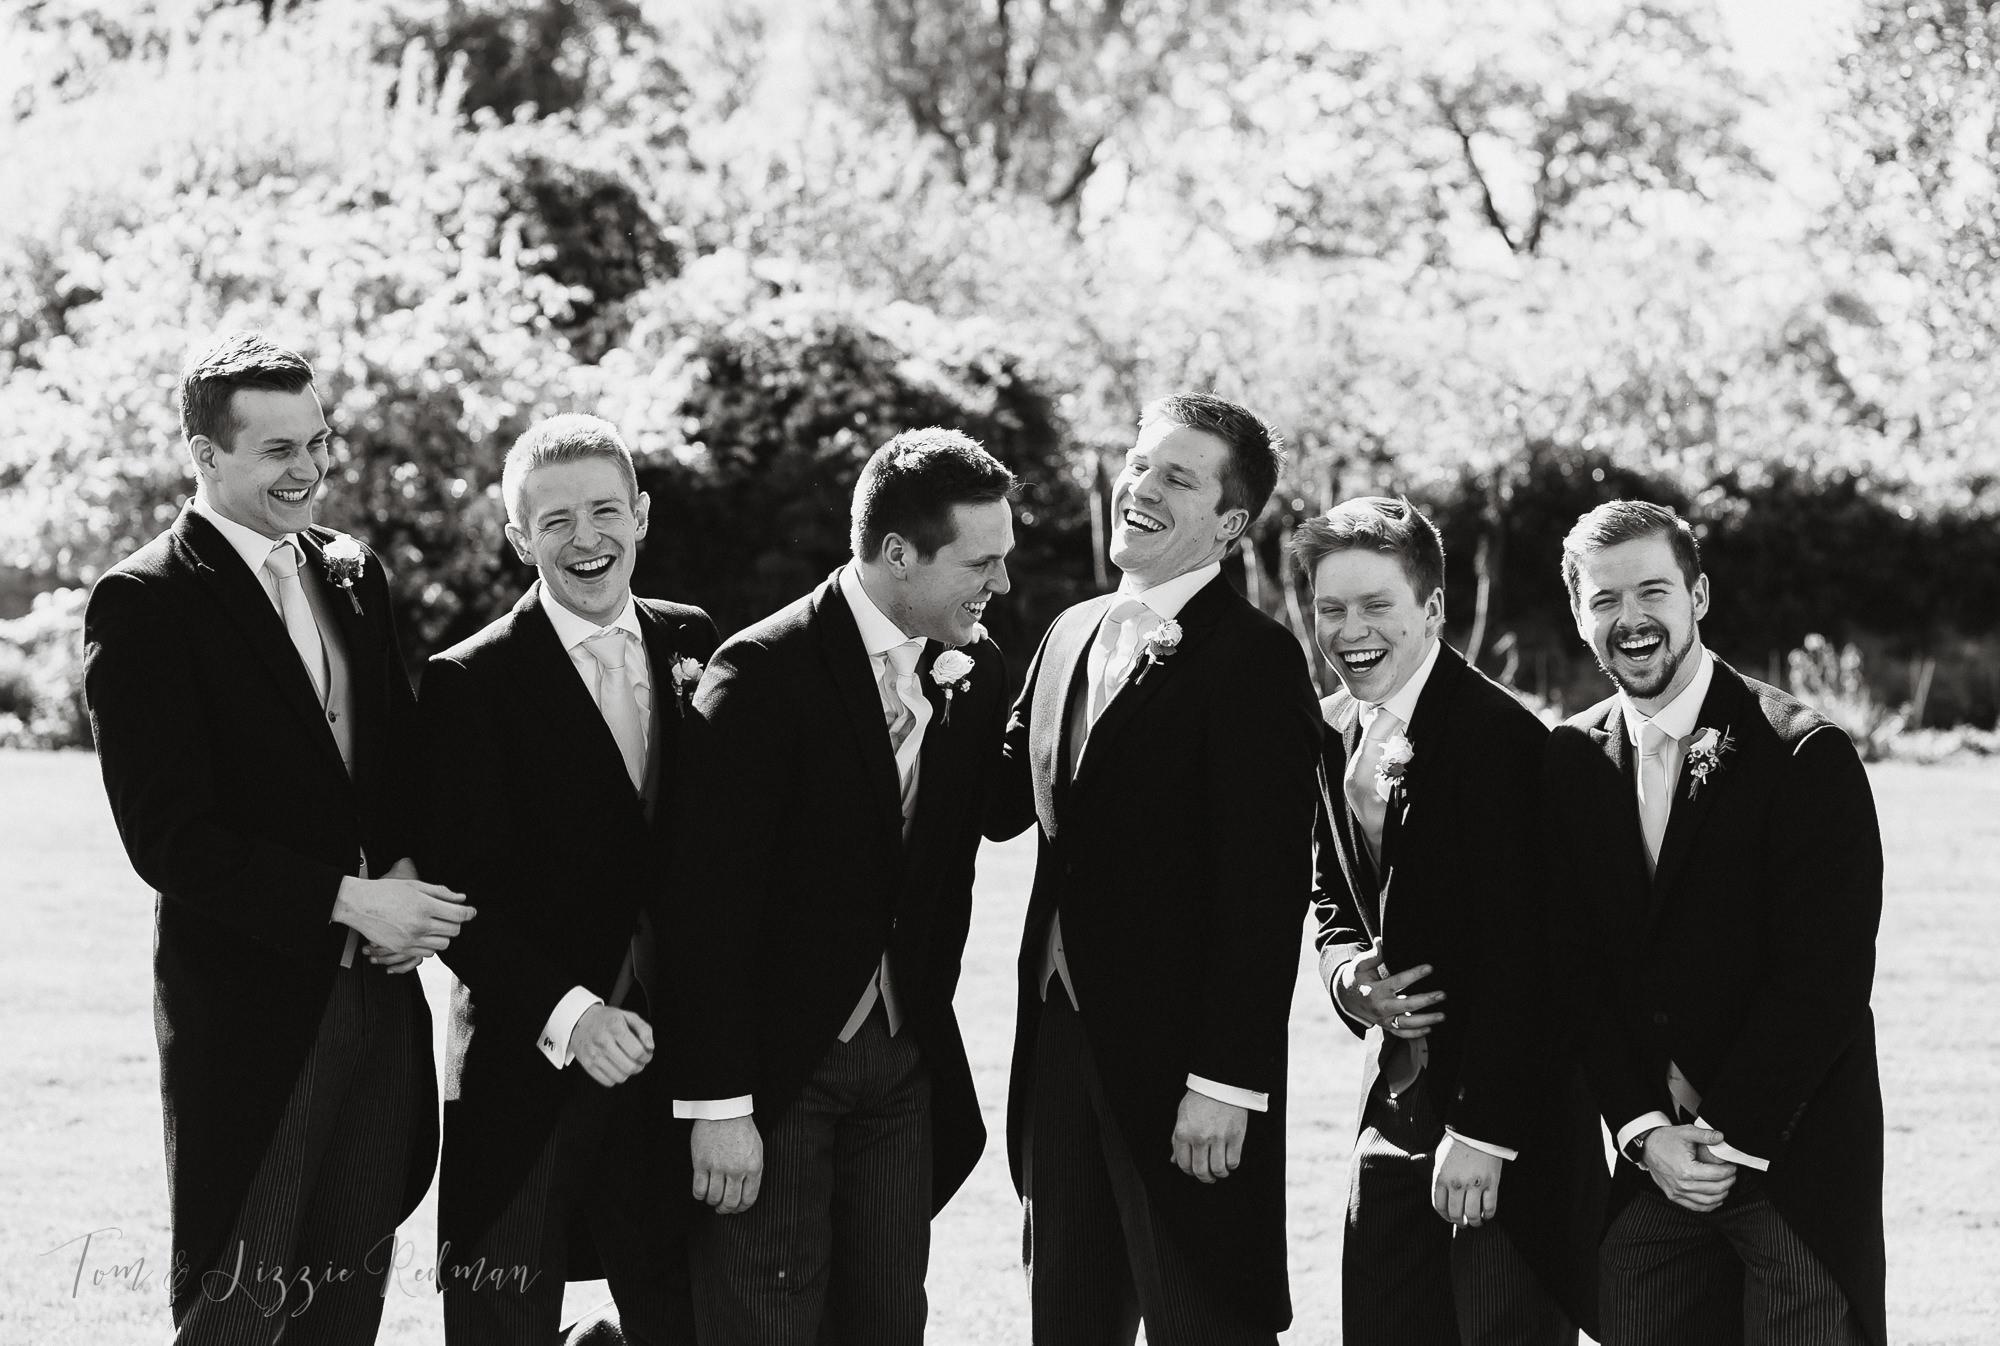 Dorset wedding photographers Tom & Lizzie Redman 033.jpg